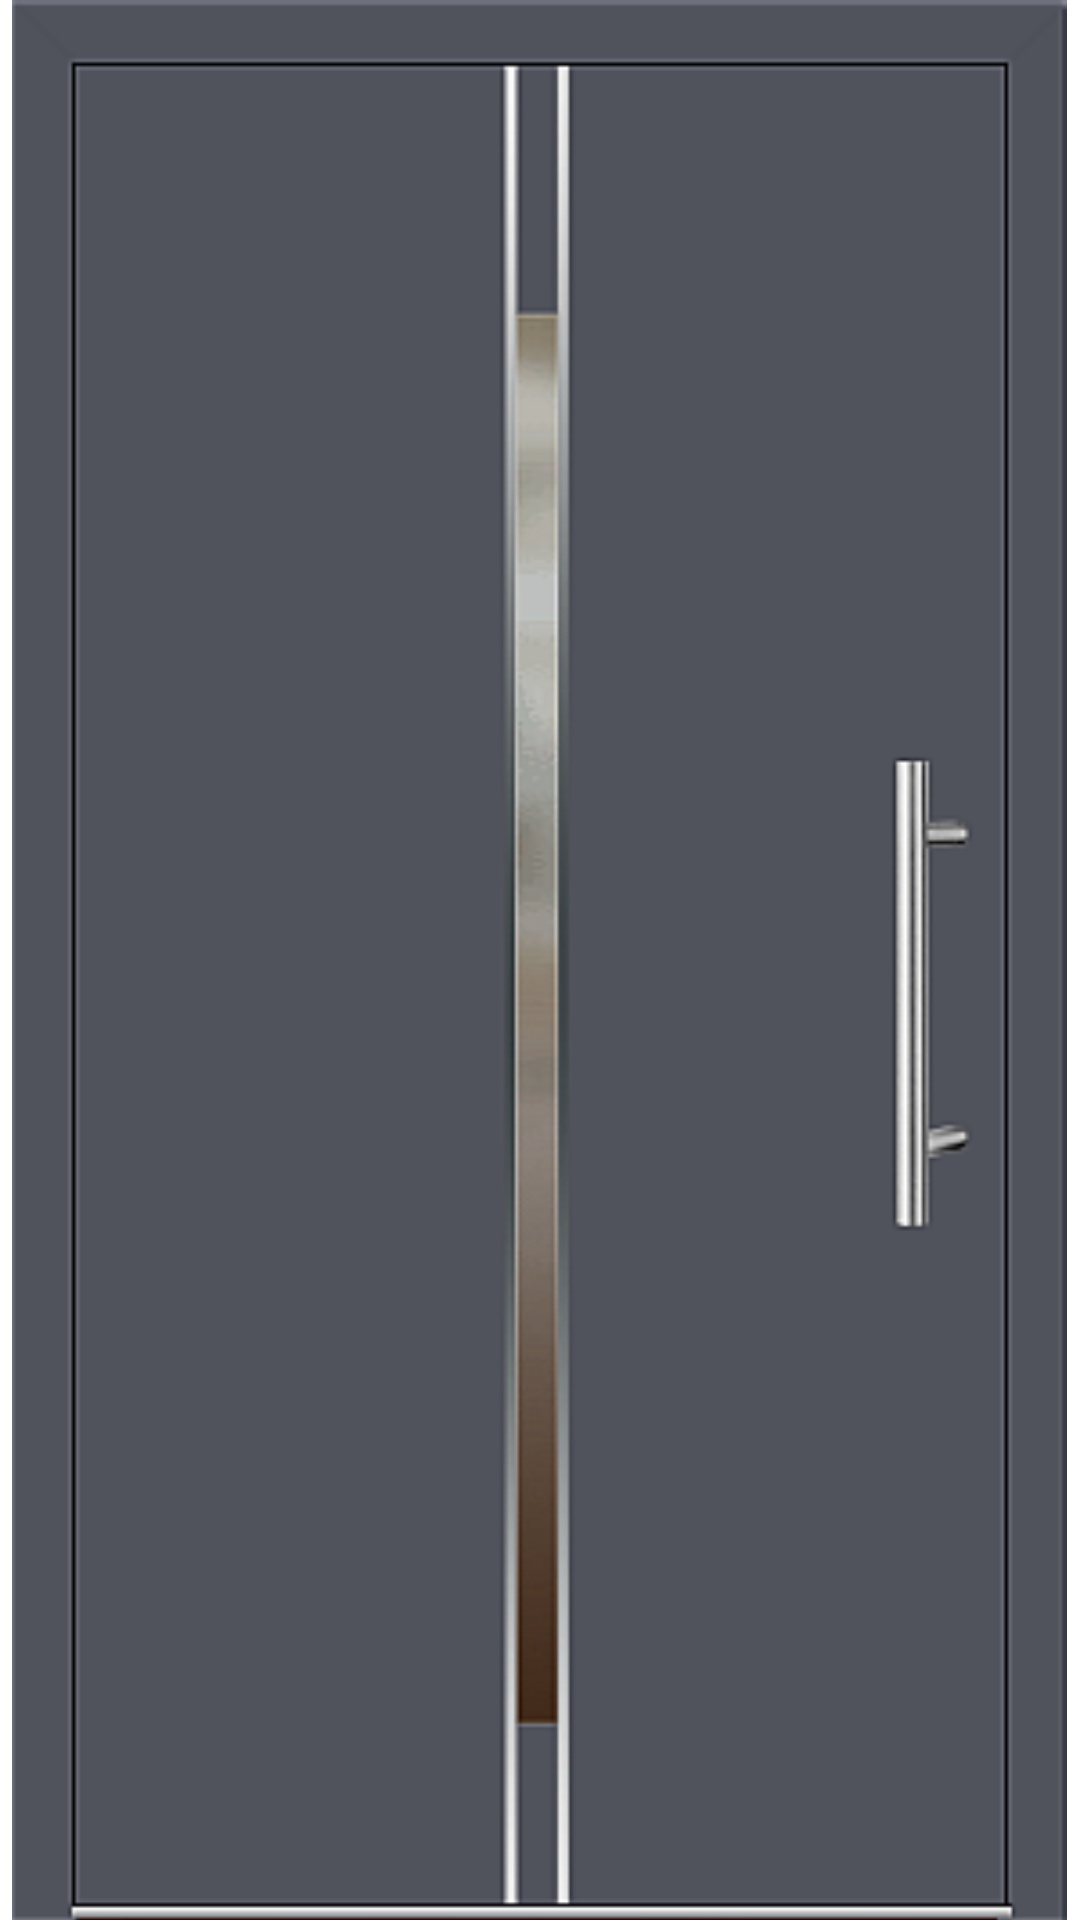 Aluminium Haustür Modell 6864-53 schiefergrau